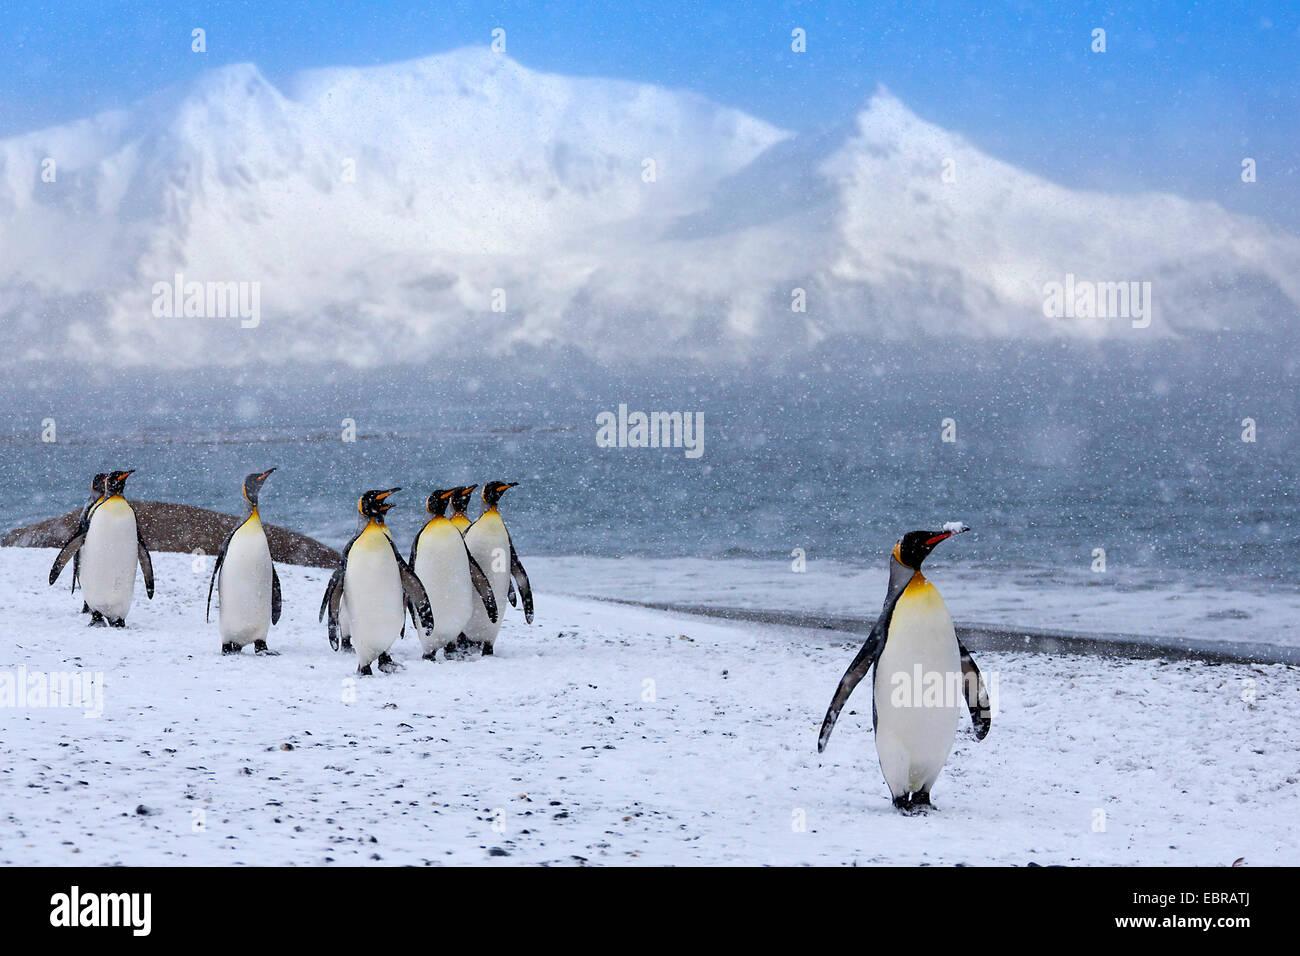 king penguin (Aptenodytes patagonicus), group in heavy snowfall, Antarctica, Suedgeorgien, St. Andrews Bay - Stock Image